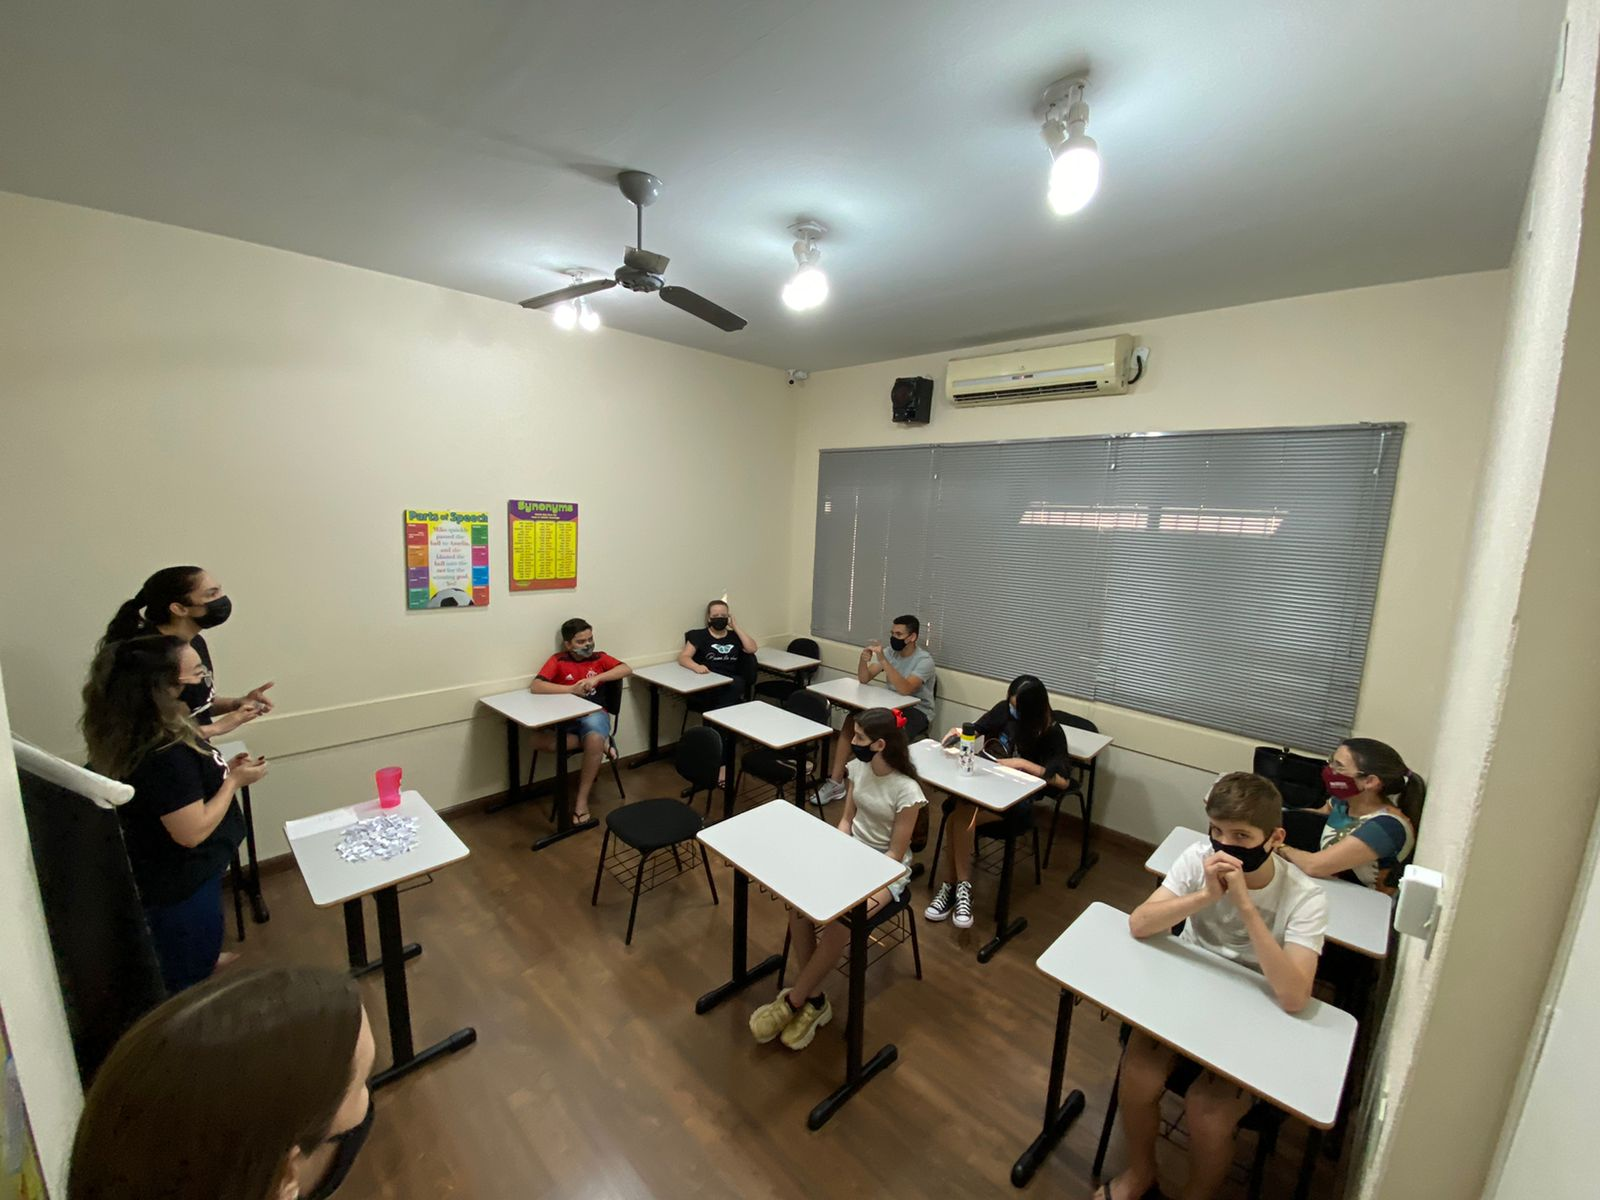 Fisk Dourados (Vl. Progresso) /MS - Spelling Bee 2021